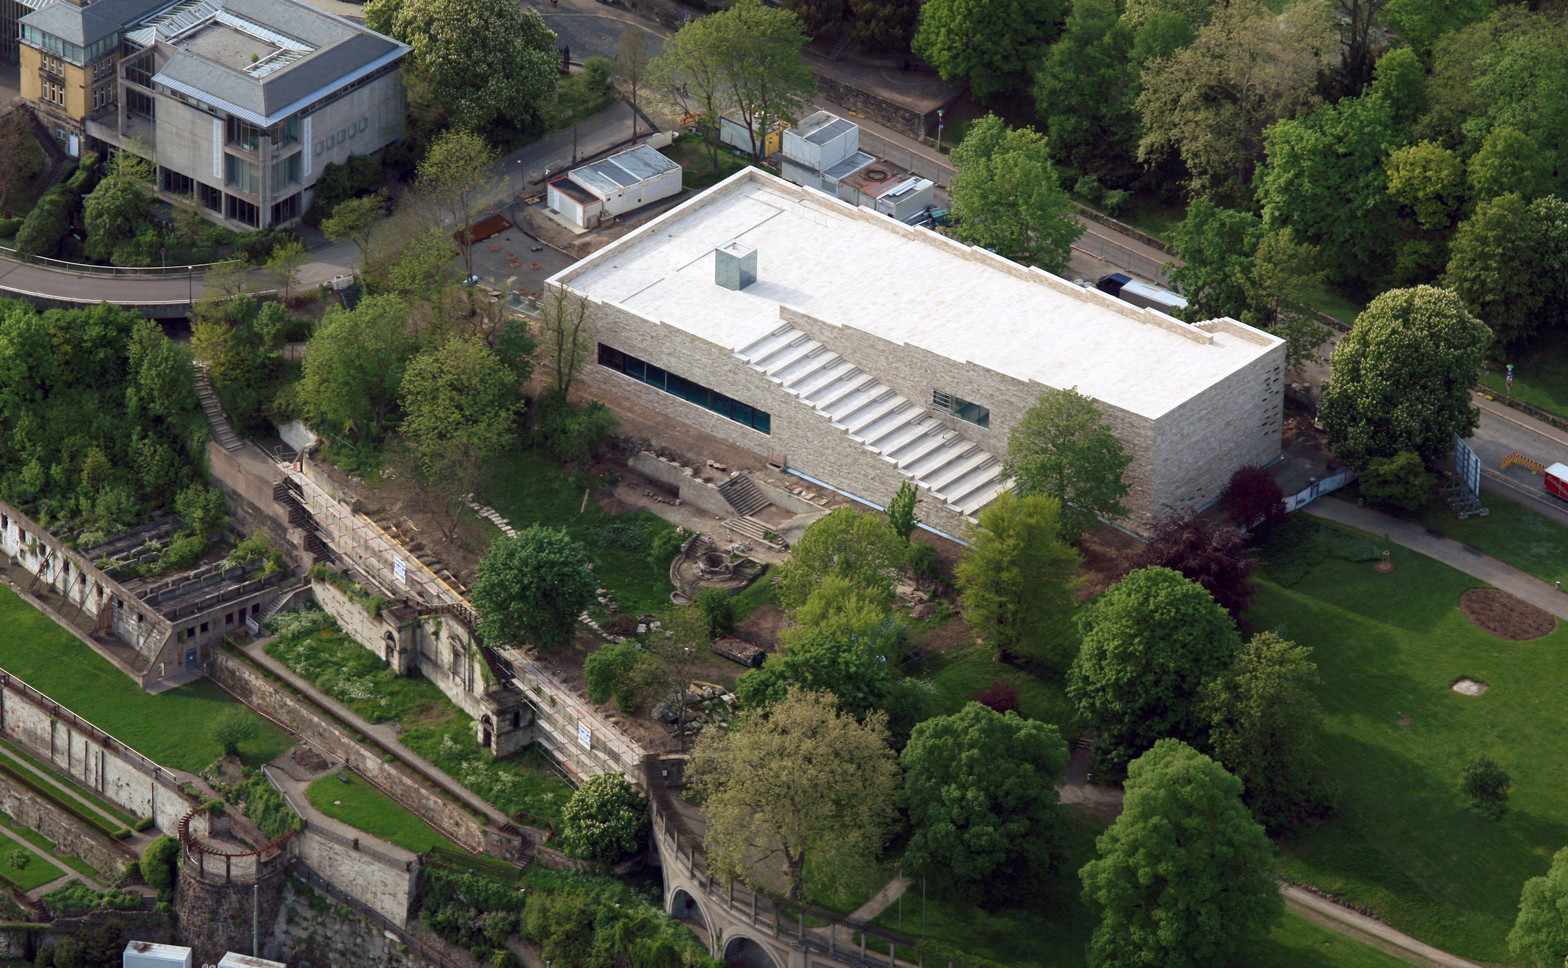 Museum-Grimmwelt-Kassel_Kada-Wittfeld_Stadt-Kassel_Architecture_Germany_dezeen_1568_0